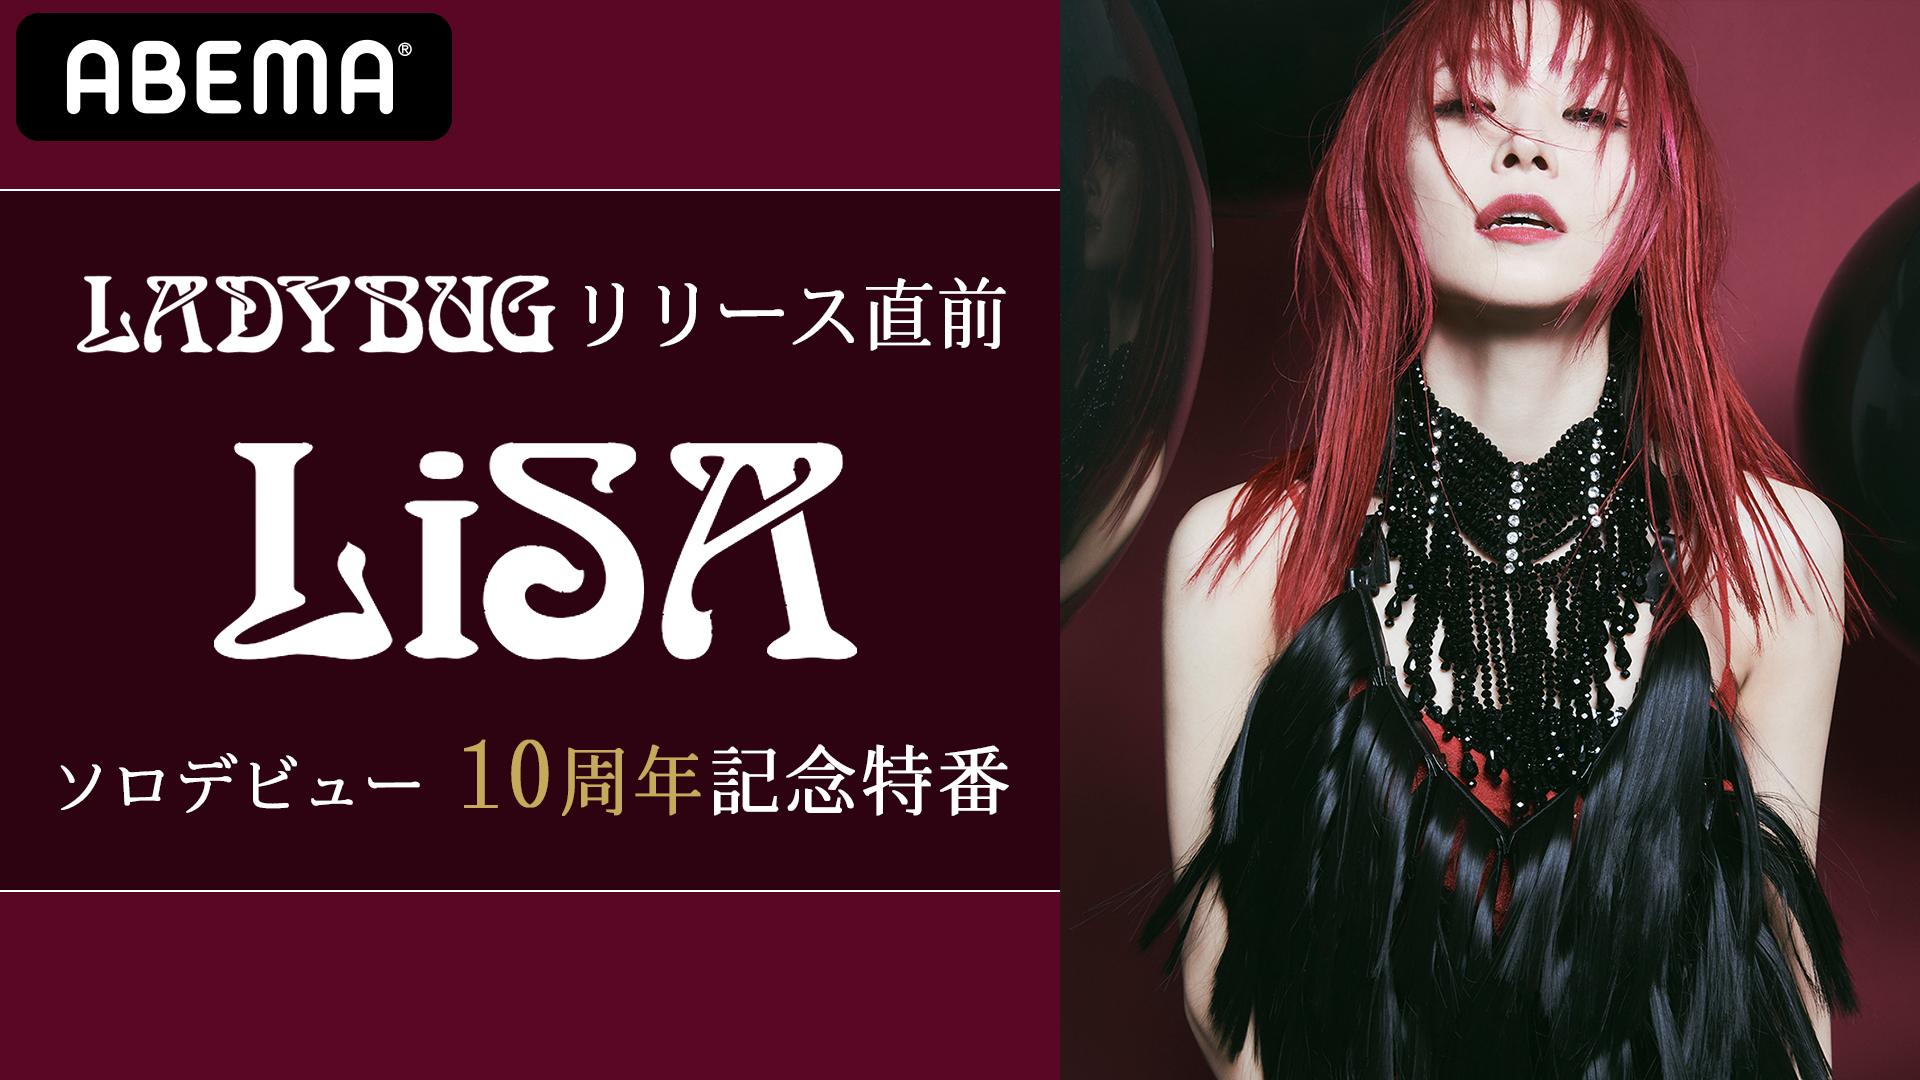 『LADYBUG』リリース直前「LiSA ソロデビュー10 周年記念特番」告知画像